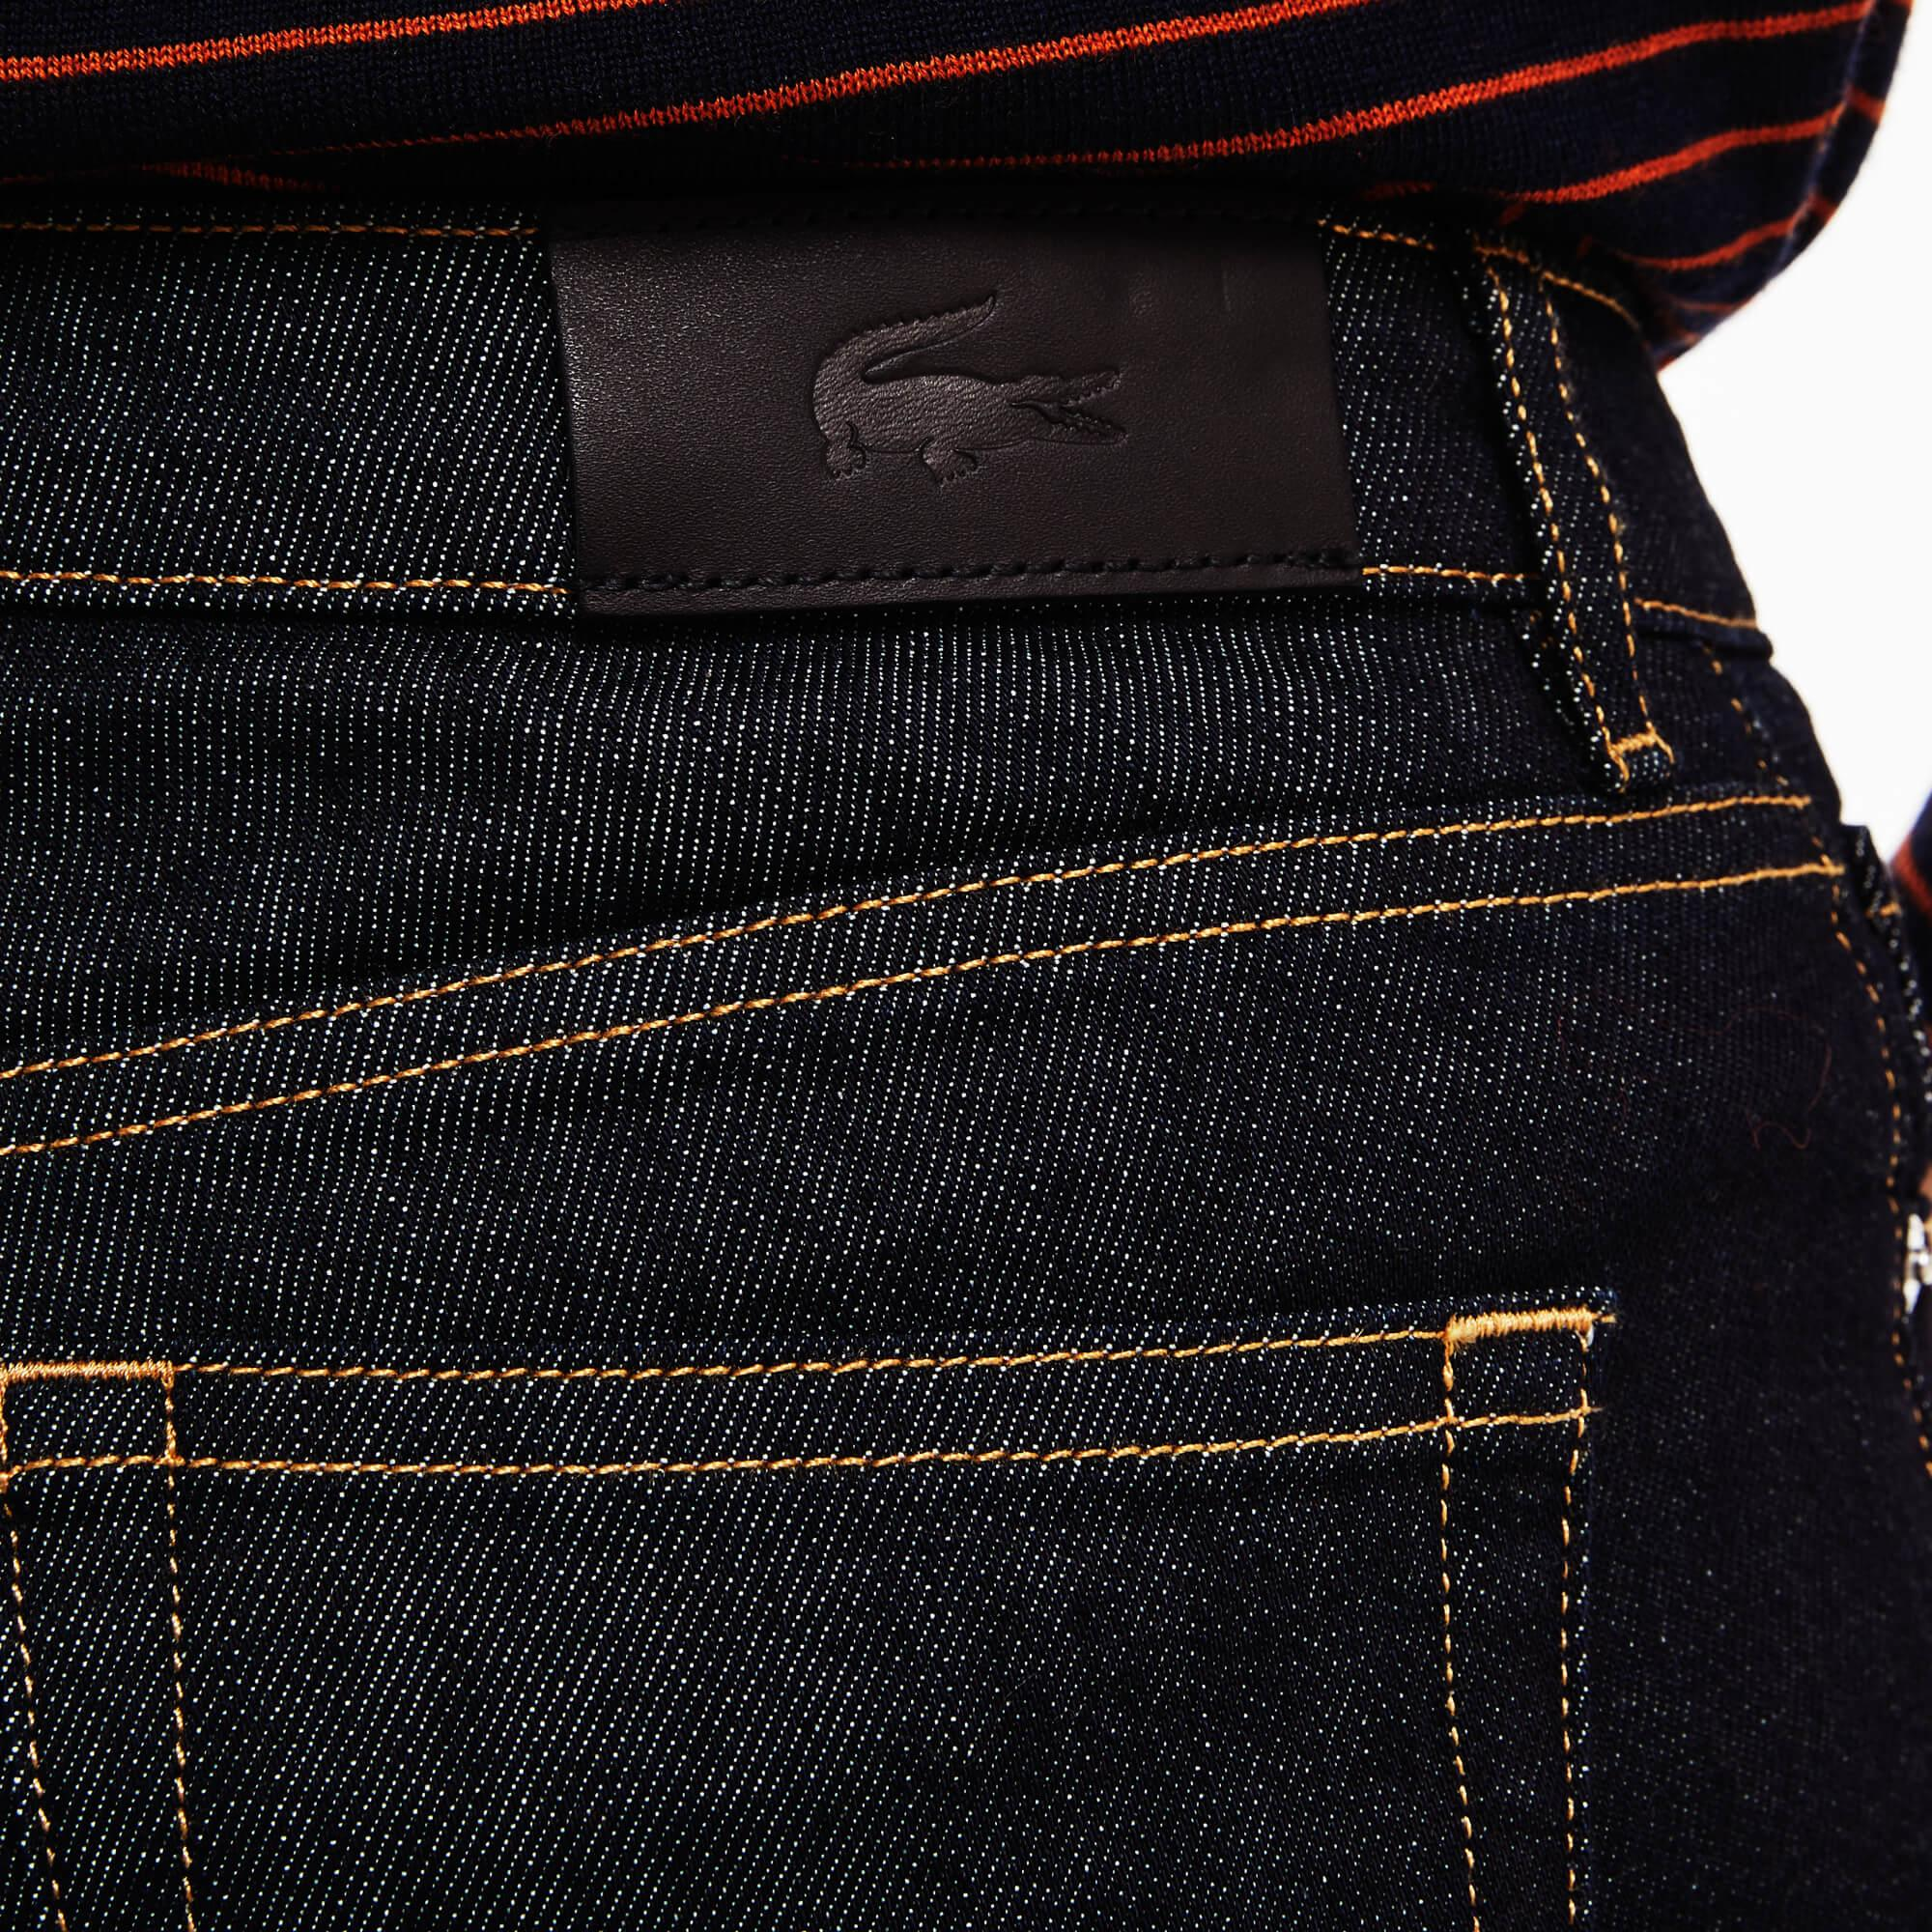 Lacoste Kadın Streç Pamuklu Lacivert Denim Pantolon